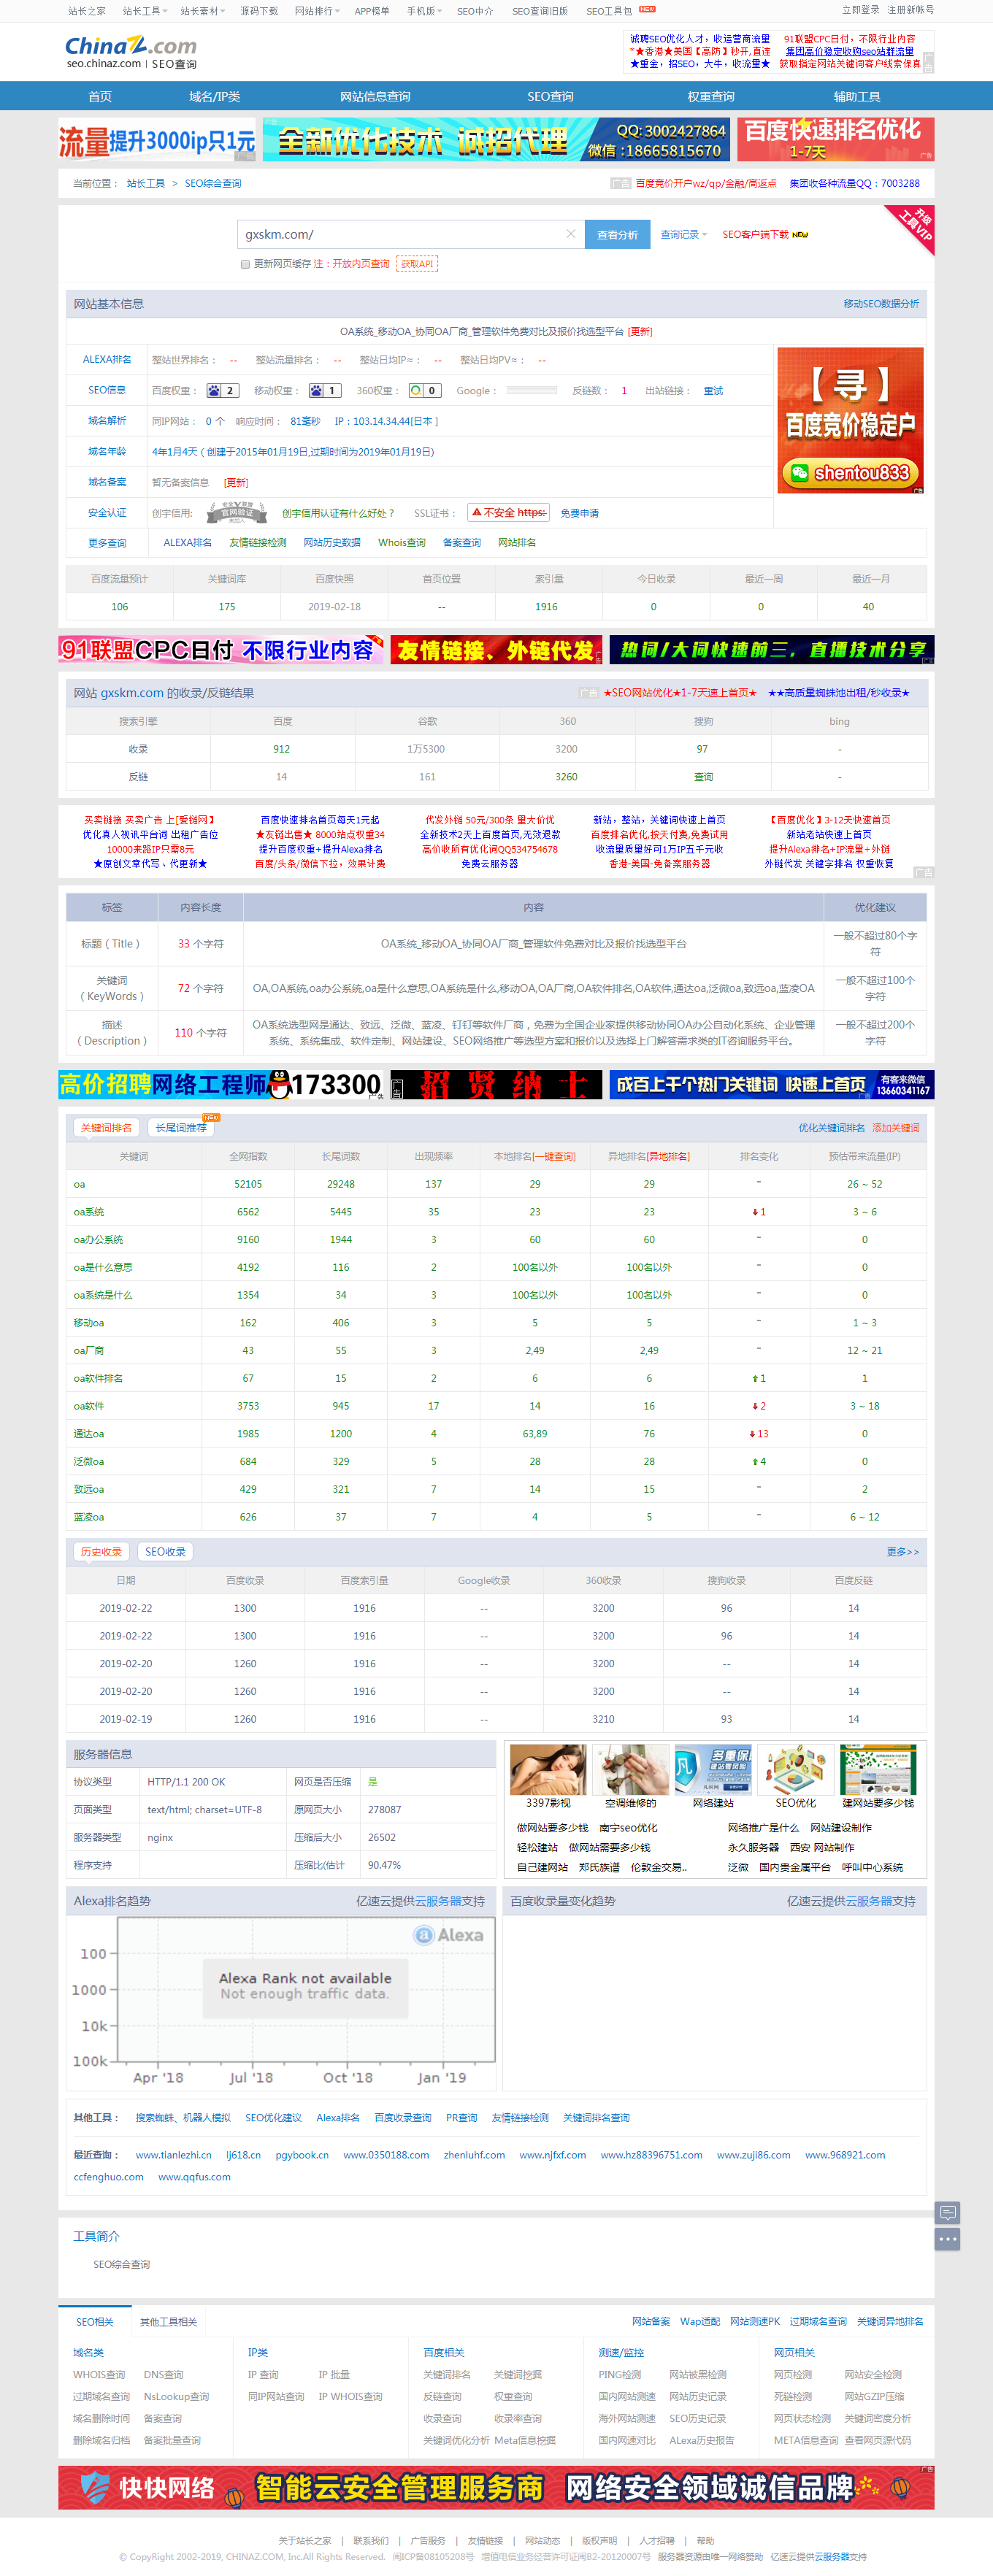 2019.2.23gxskm.comOA系统的SEO综合查询 - 站长工具.png